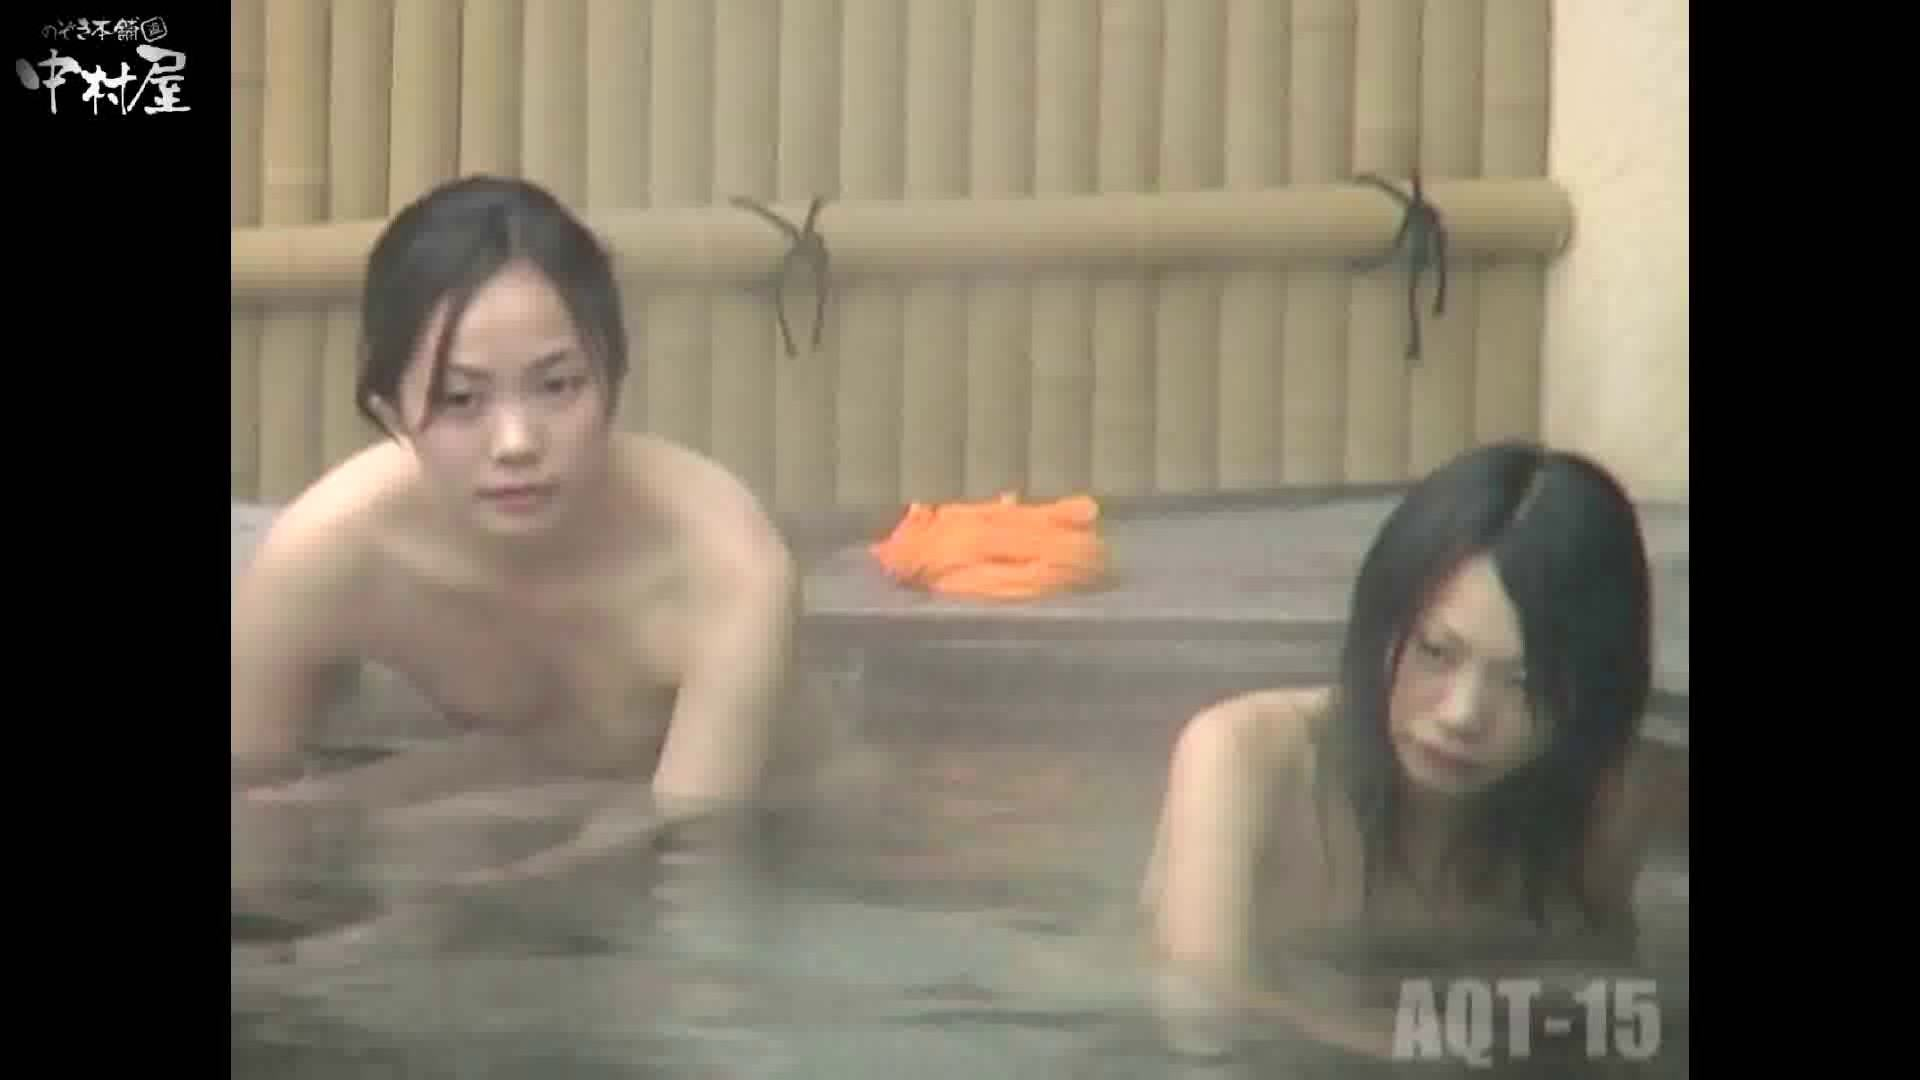 Aquaな露天風呂Vol.878潜入盗撮露天風呂十五判湯 其の八 潜入 | 露天風呂編  96PIX 43